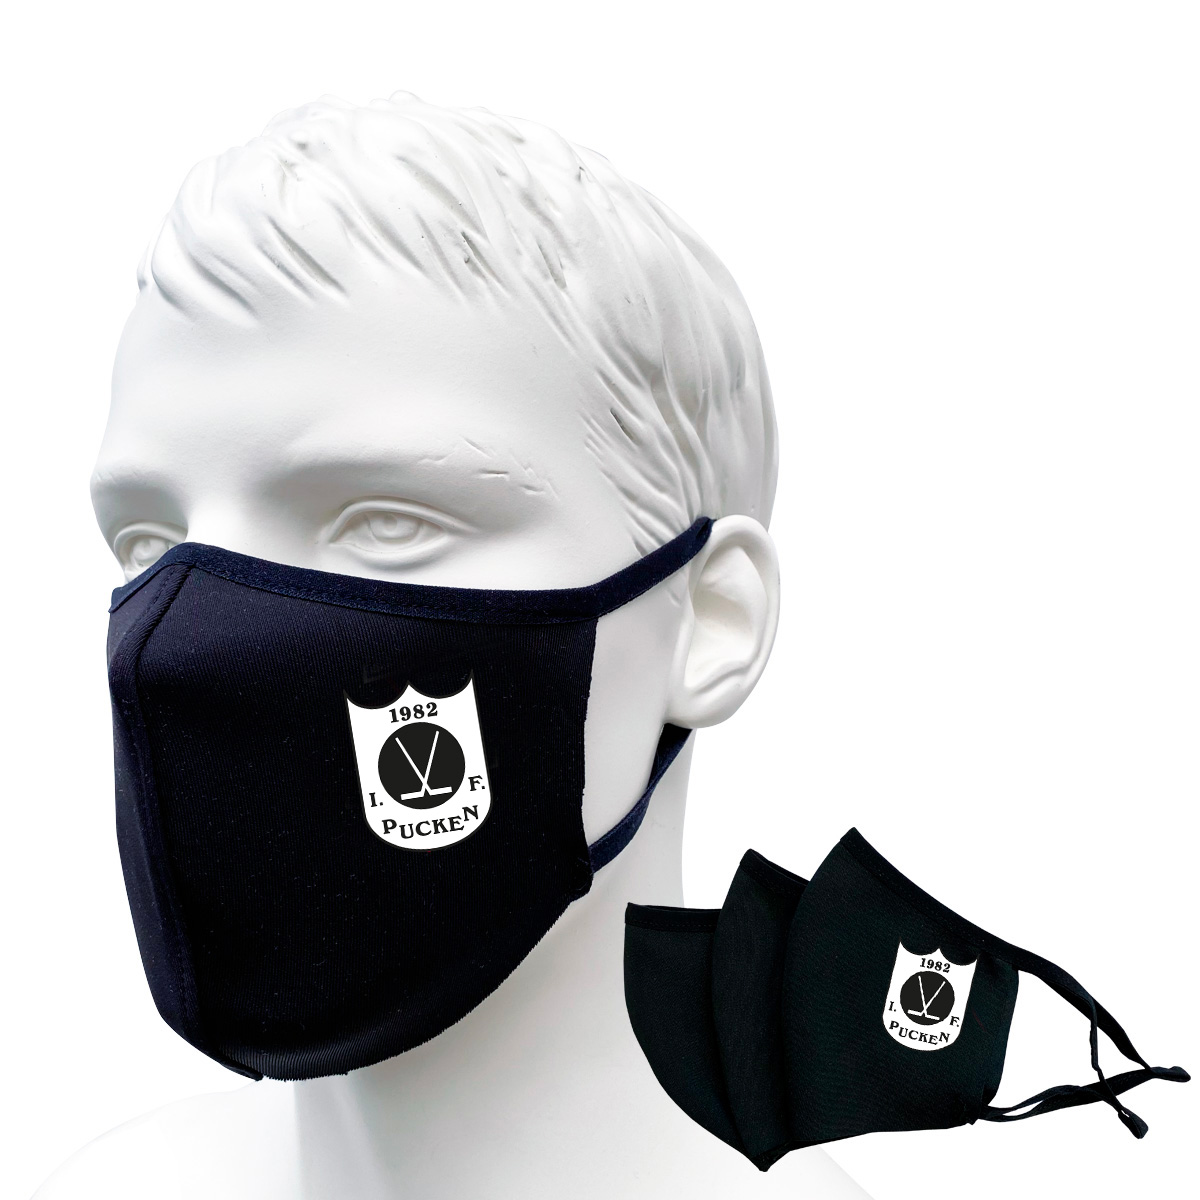 Pucken-fani-maski